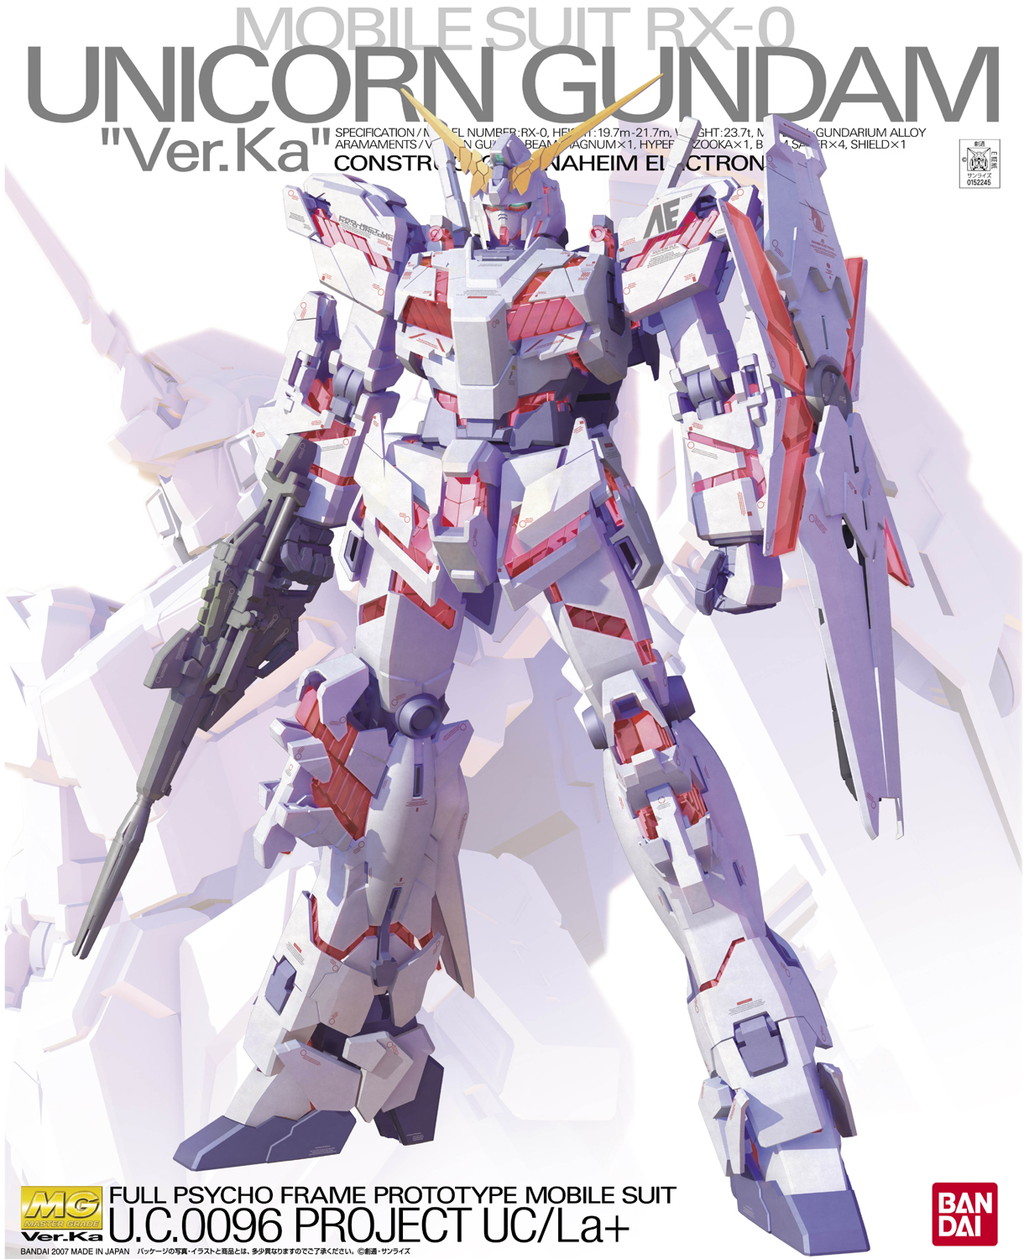 MG 1/100 RX-0 ユニコーンガンダム Ver.Ka [Unicorn Gundam Ver.Ka]